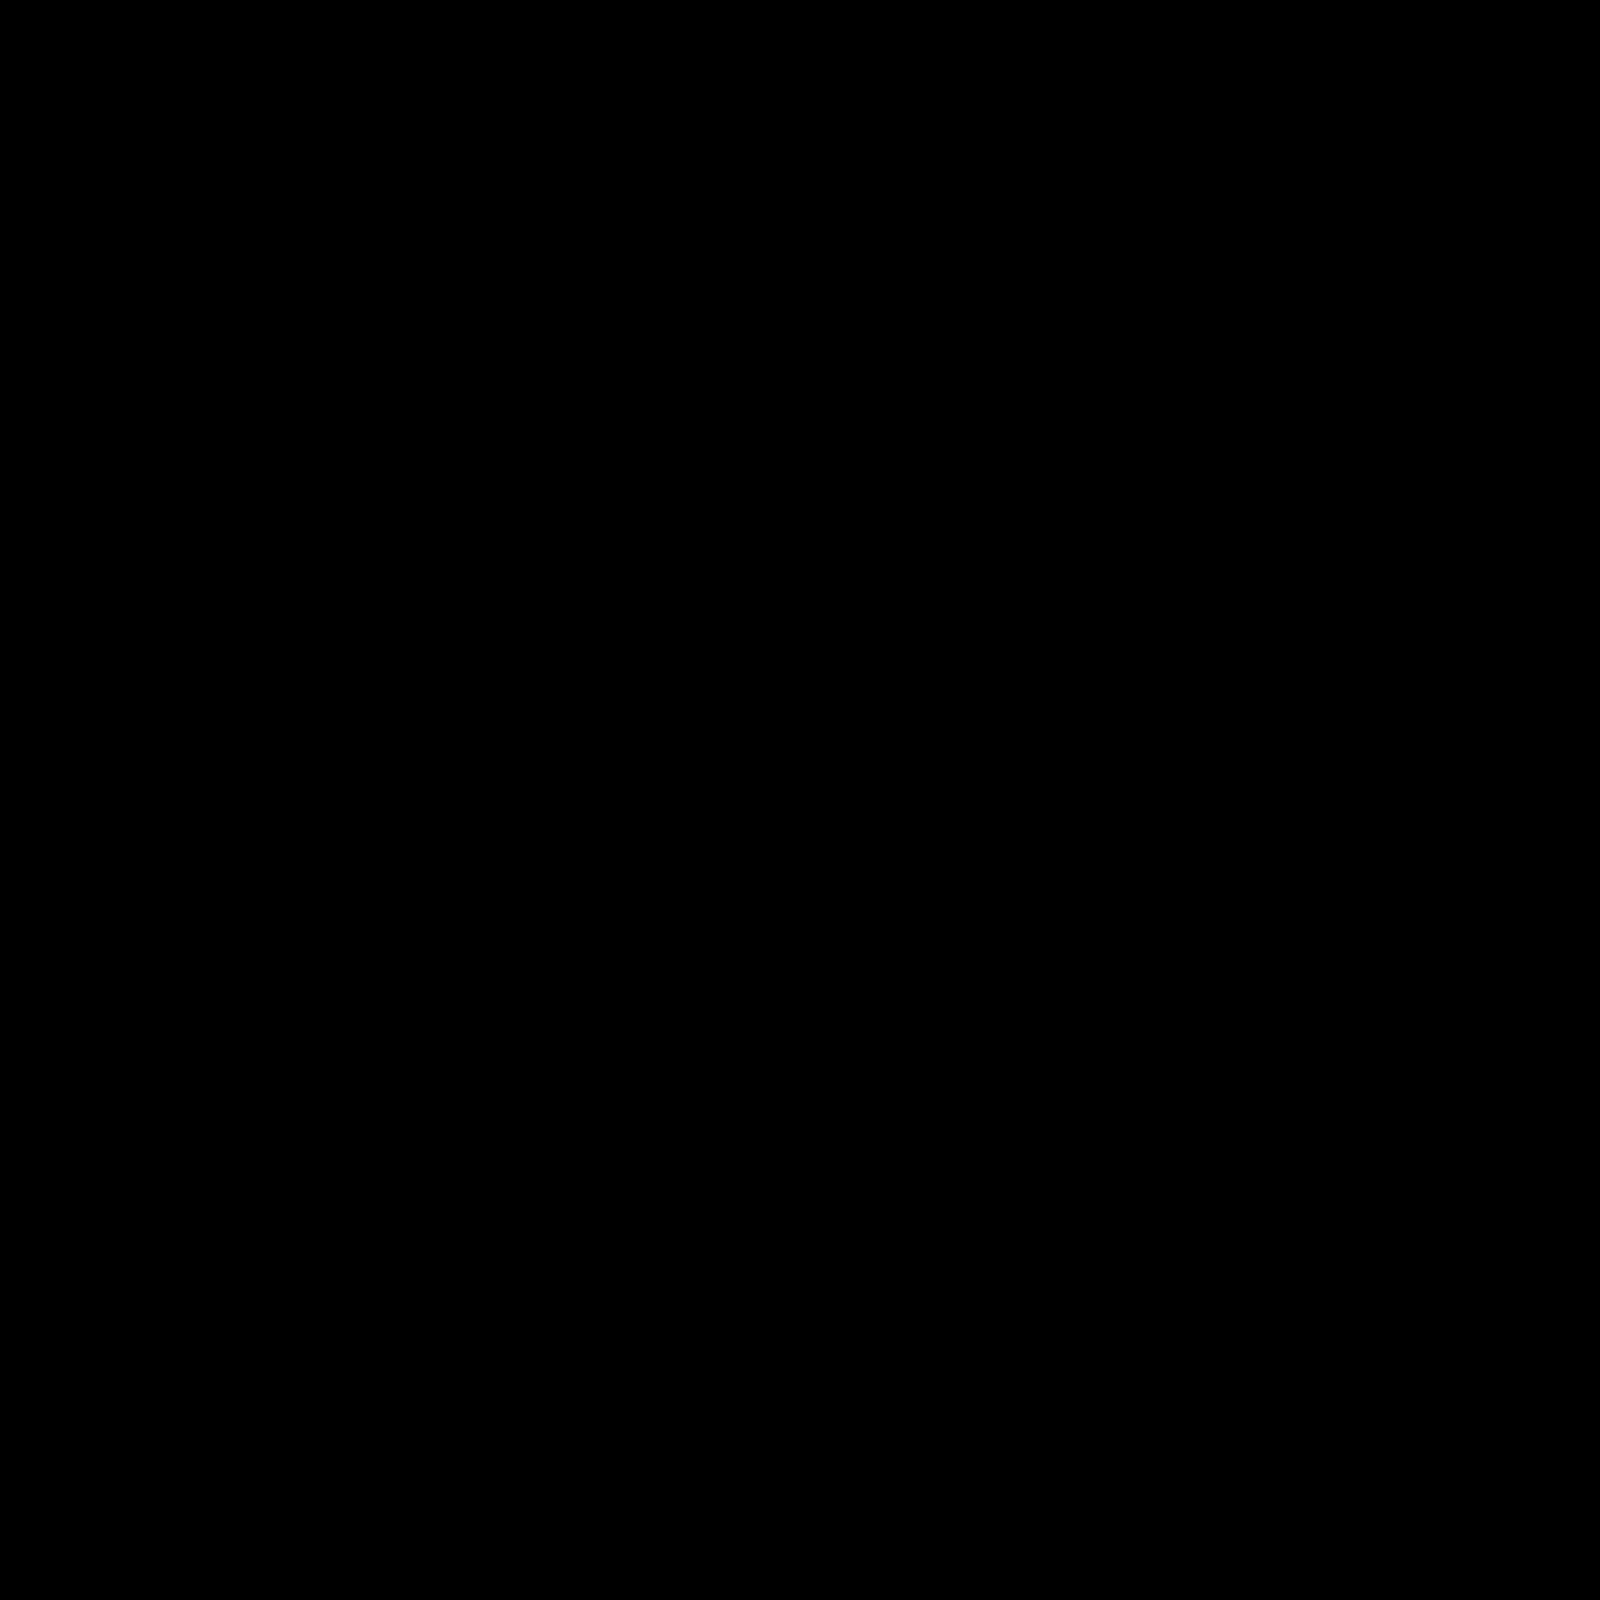 Procurement Filled icon